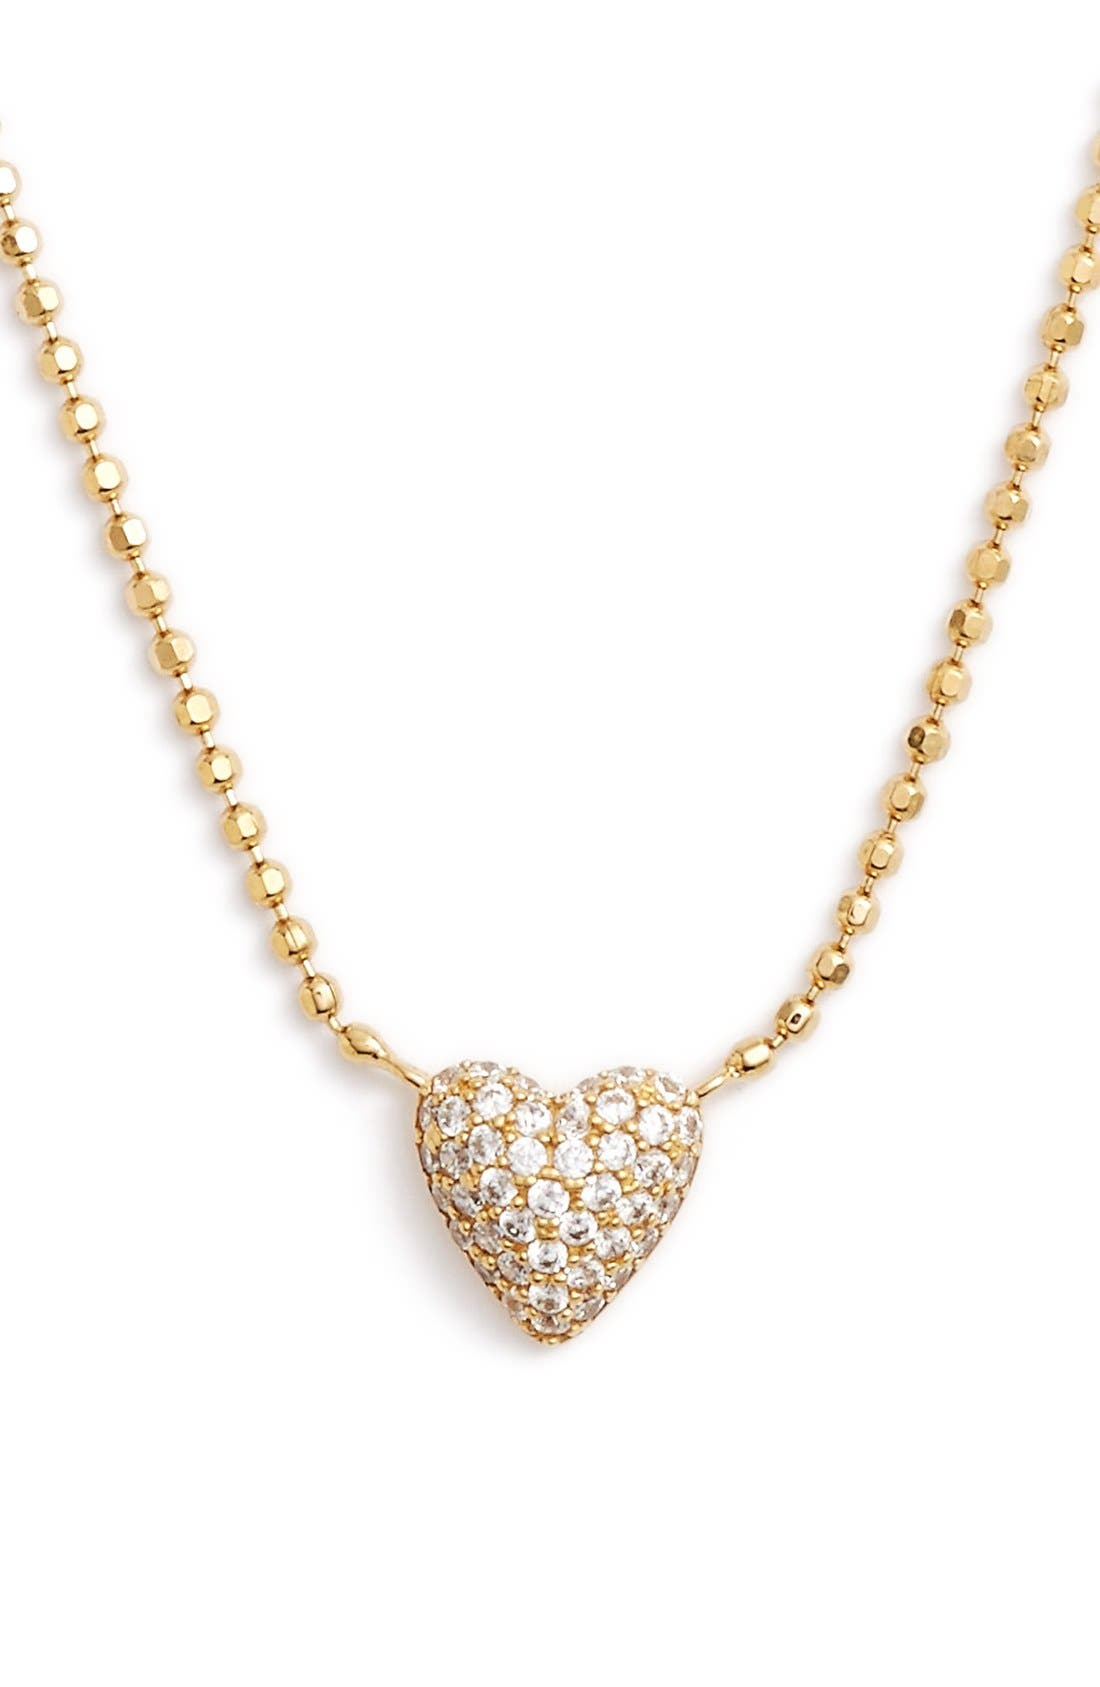 Main Image - Nadri 'Valentine's Day' Heart Pendant Necklace